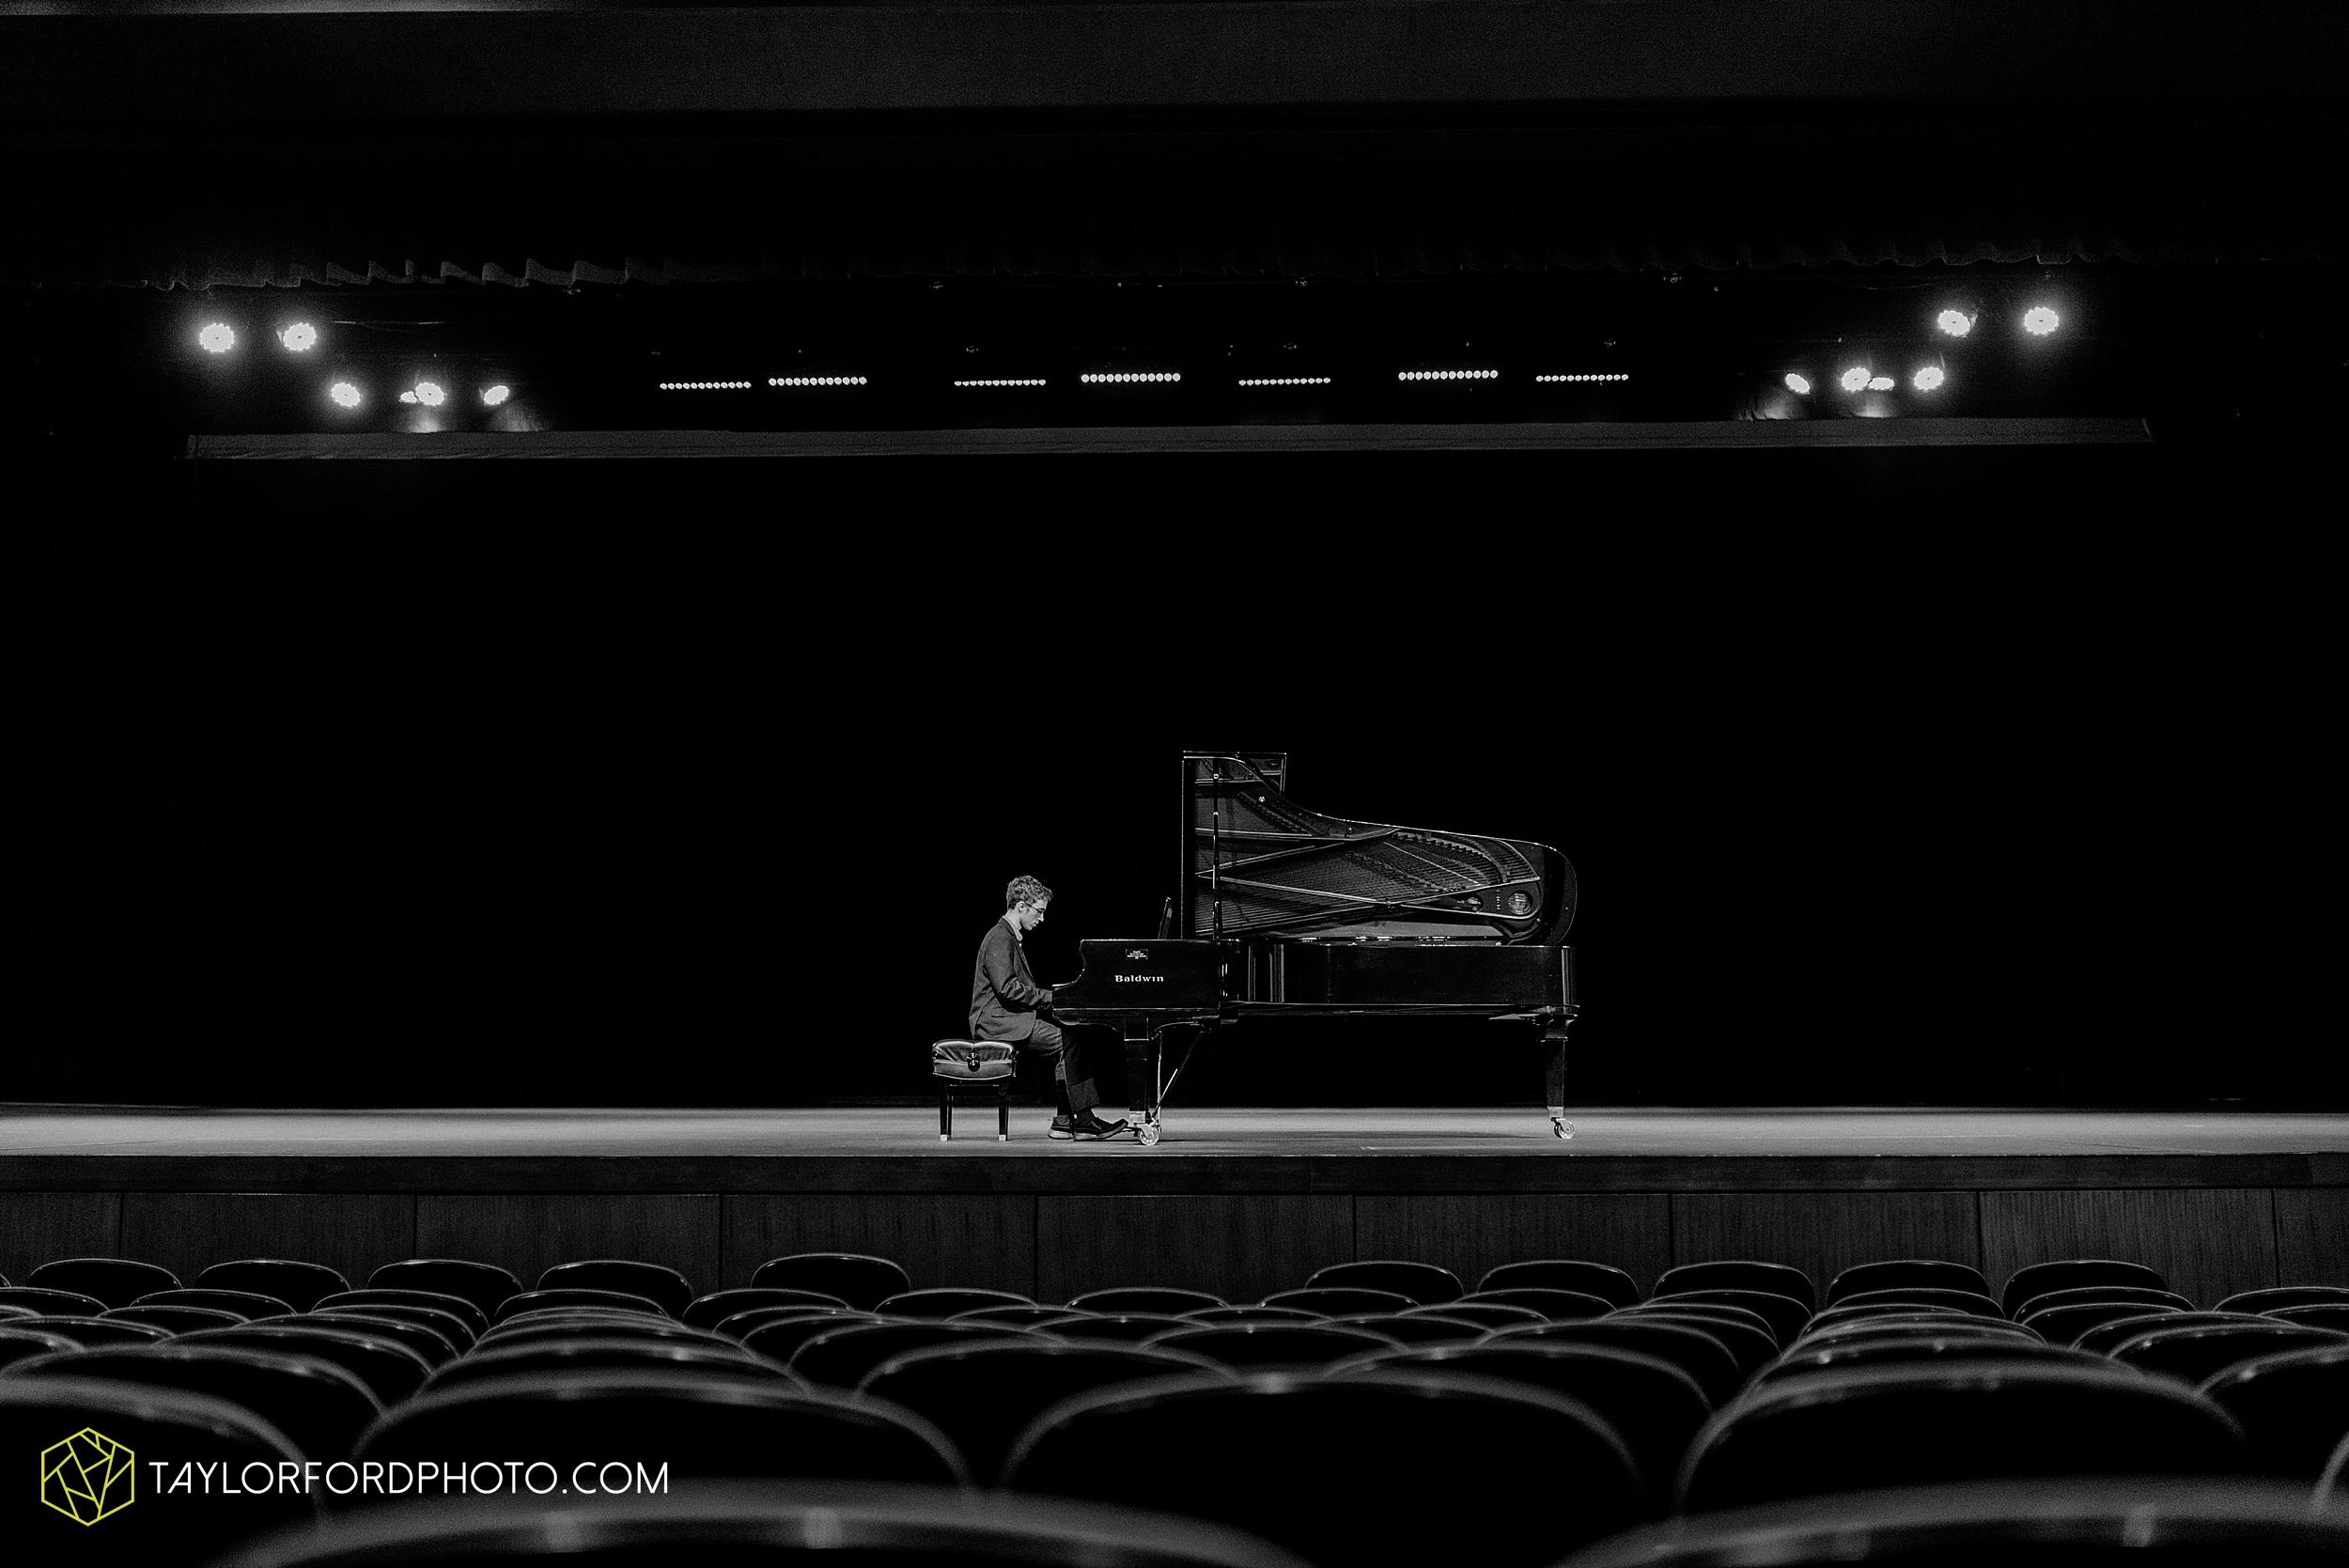 niswonger-performing-arts-center-npac-van-wert-ohio-high-school-senior-calahan-wolfrum-downtown-main-street-photographer-taylor-ford-photography_9992.jpg